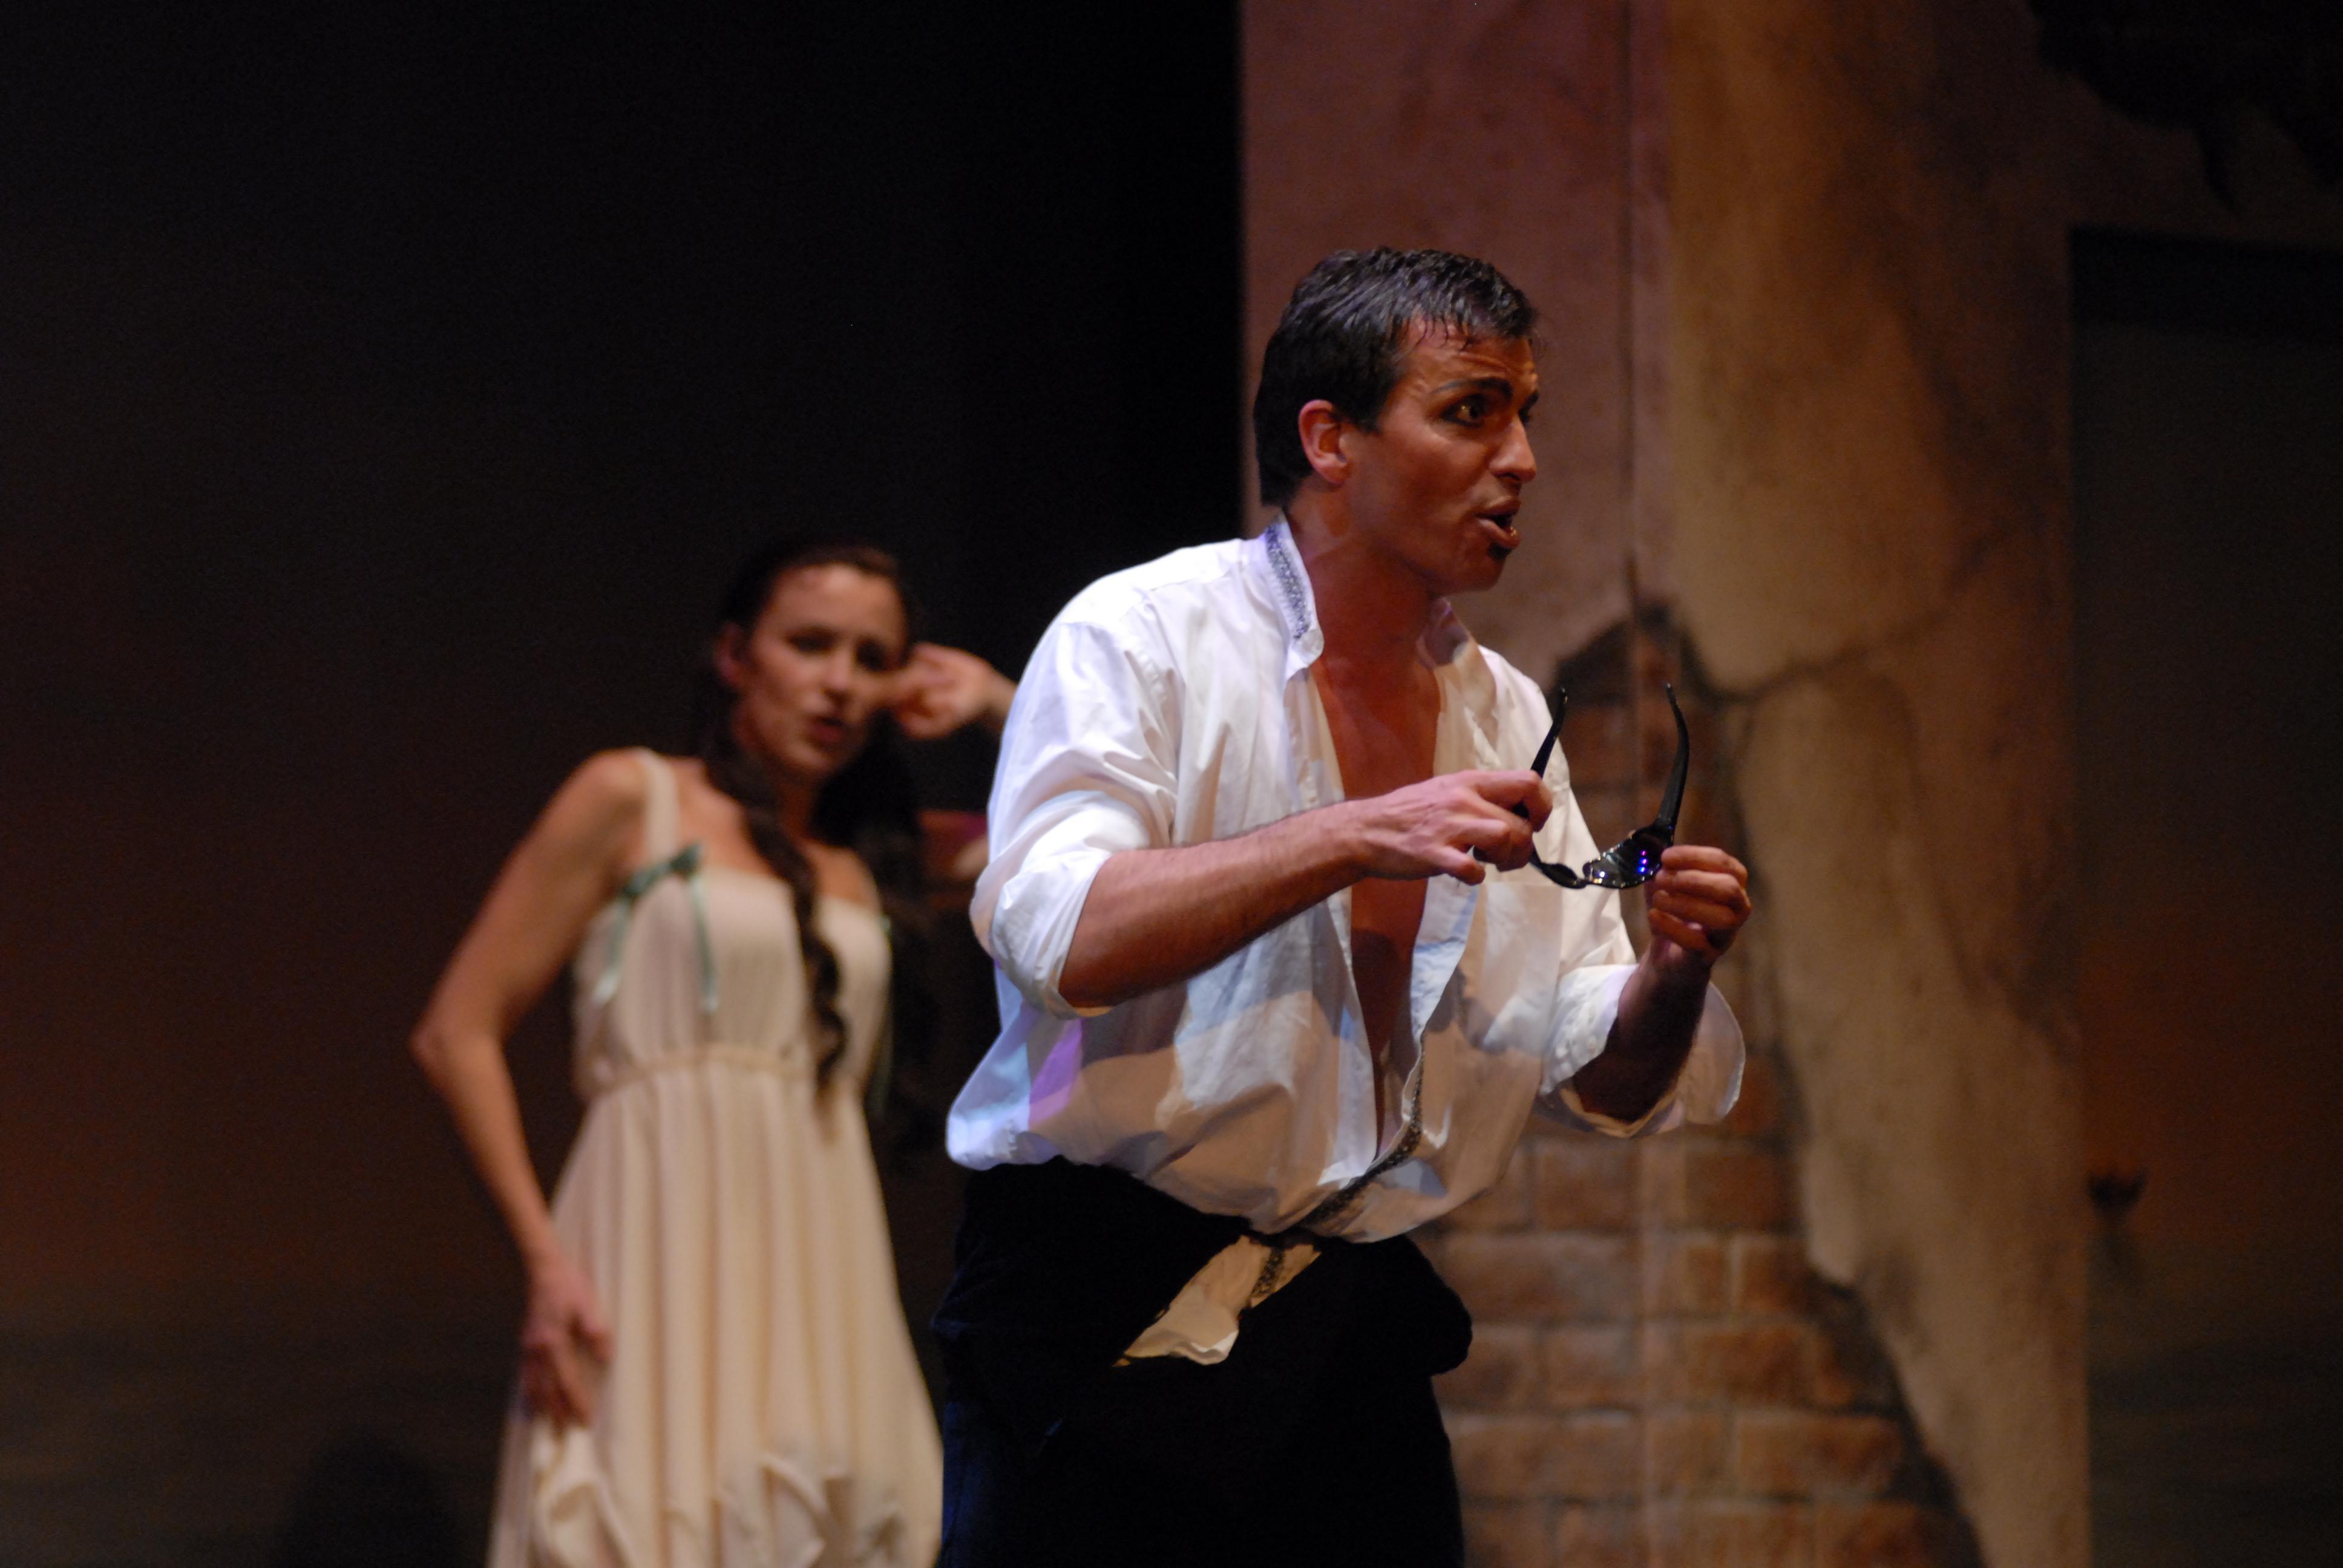 Selim, Regia di Beppe de Tommasi